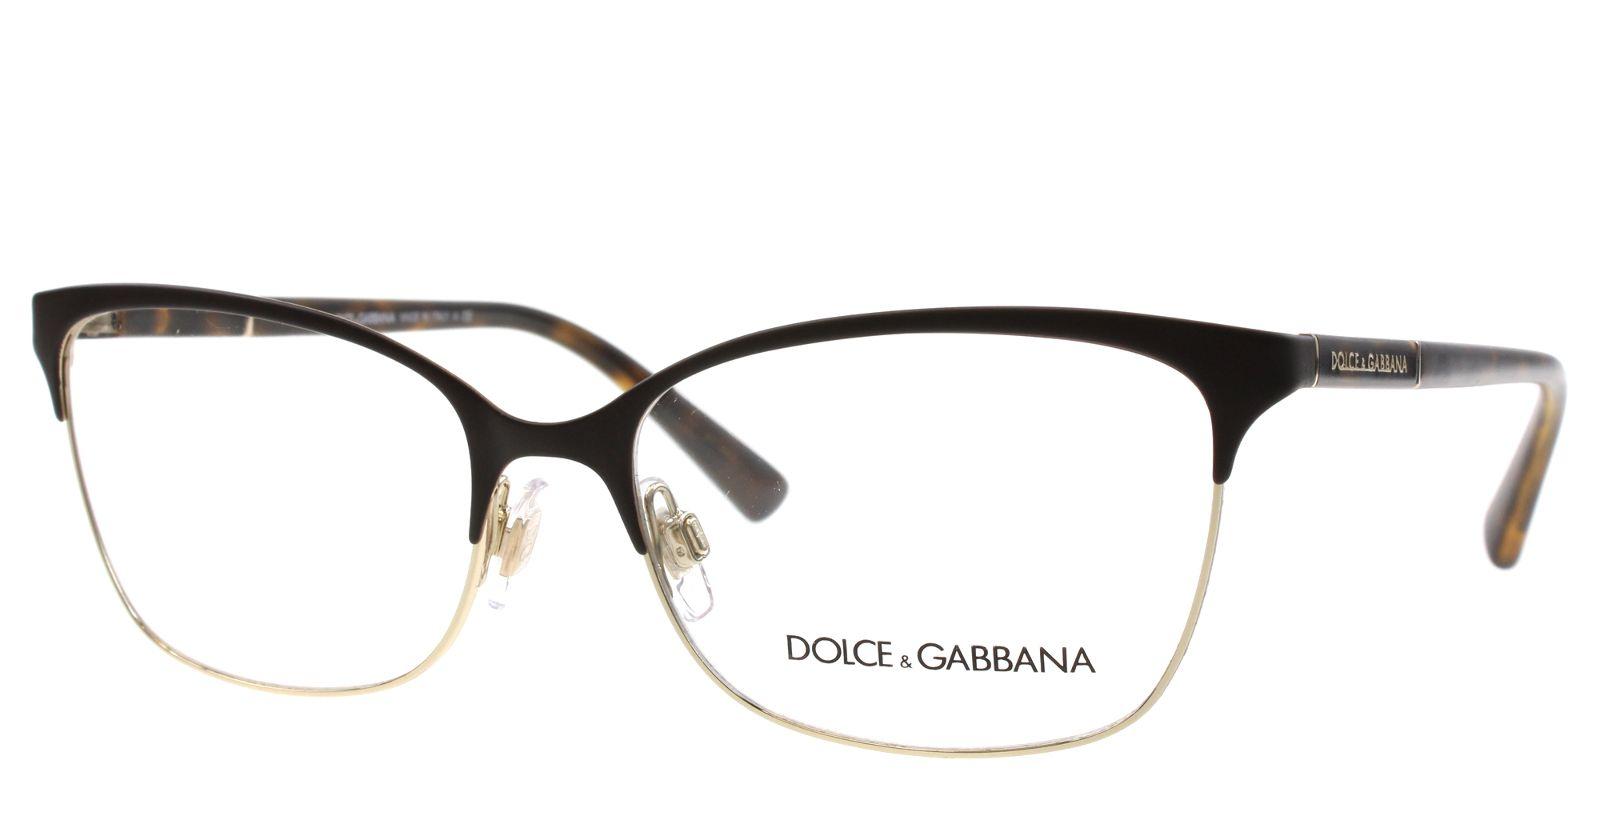 new dolce gabbana eyeglasses women cat eye dg 1268 havana 1254 - Dolce And Gabbana Eyeglass Frames